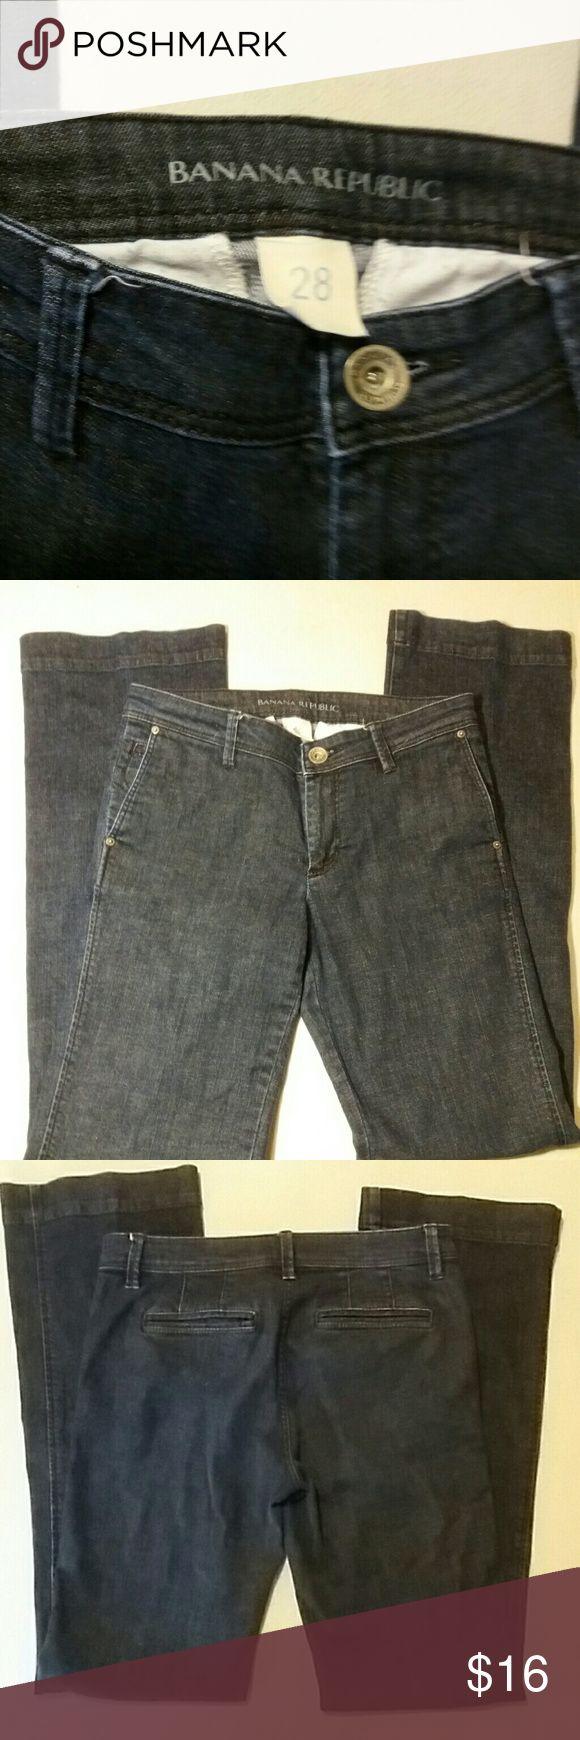 Banana Republic Dark Blue Demin Trousers Inseam: 32 inches, waist: 30 inches. Banana Republic Jeans Boot Cut